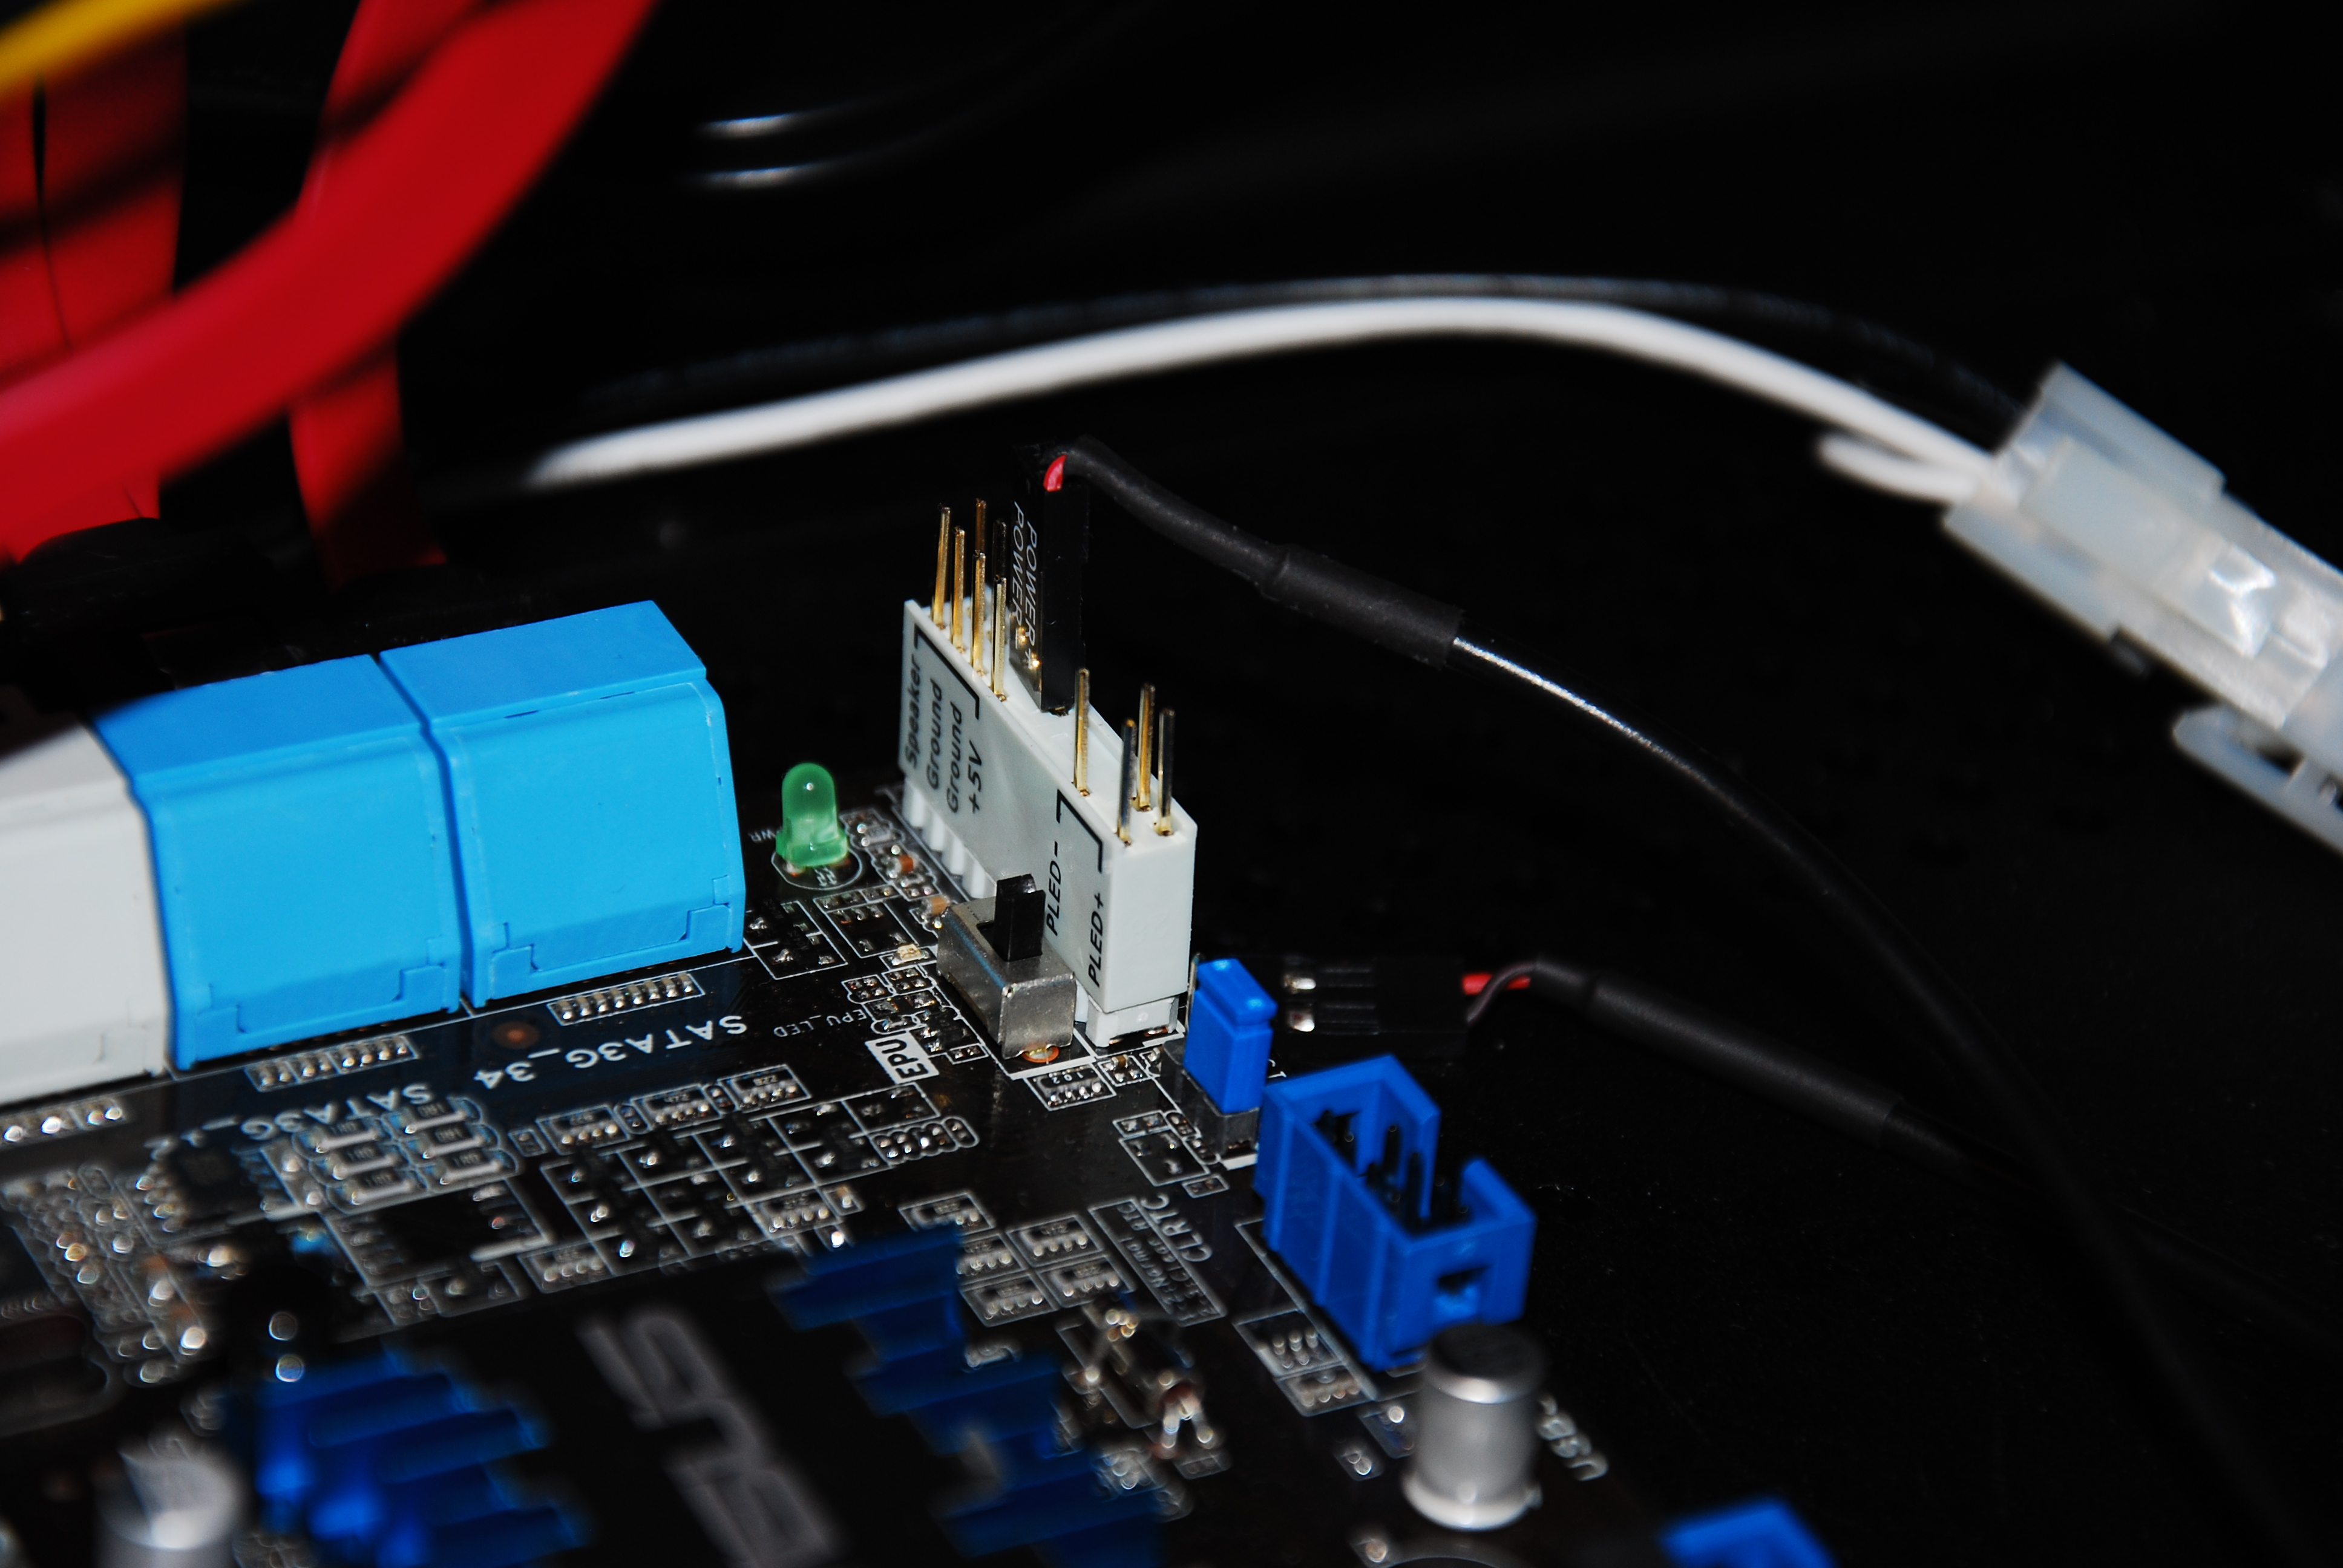 Meet my first HTPC: Fanless, NAS/RAID1, Linux, 30 watts, 24x7, FC10